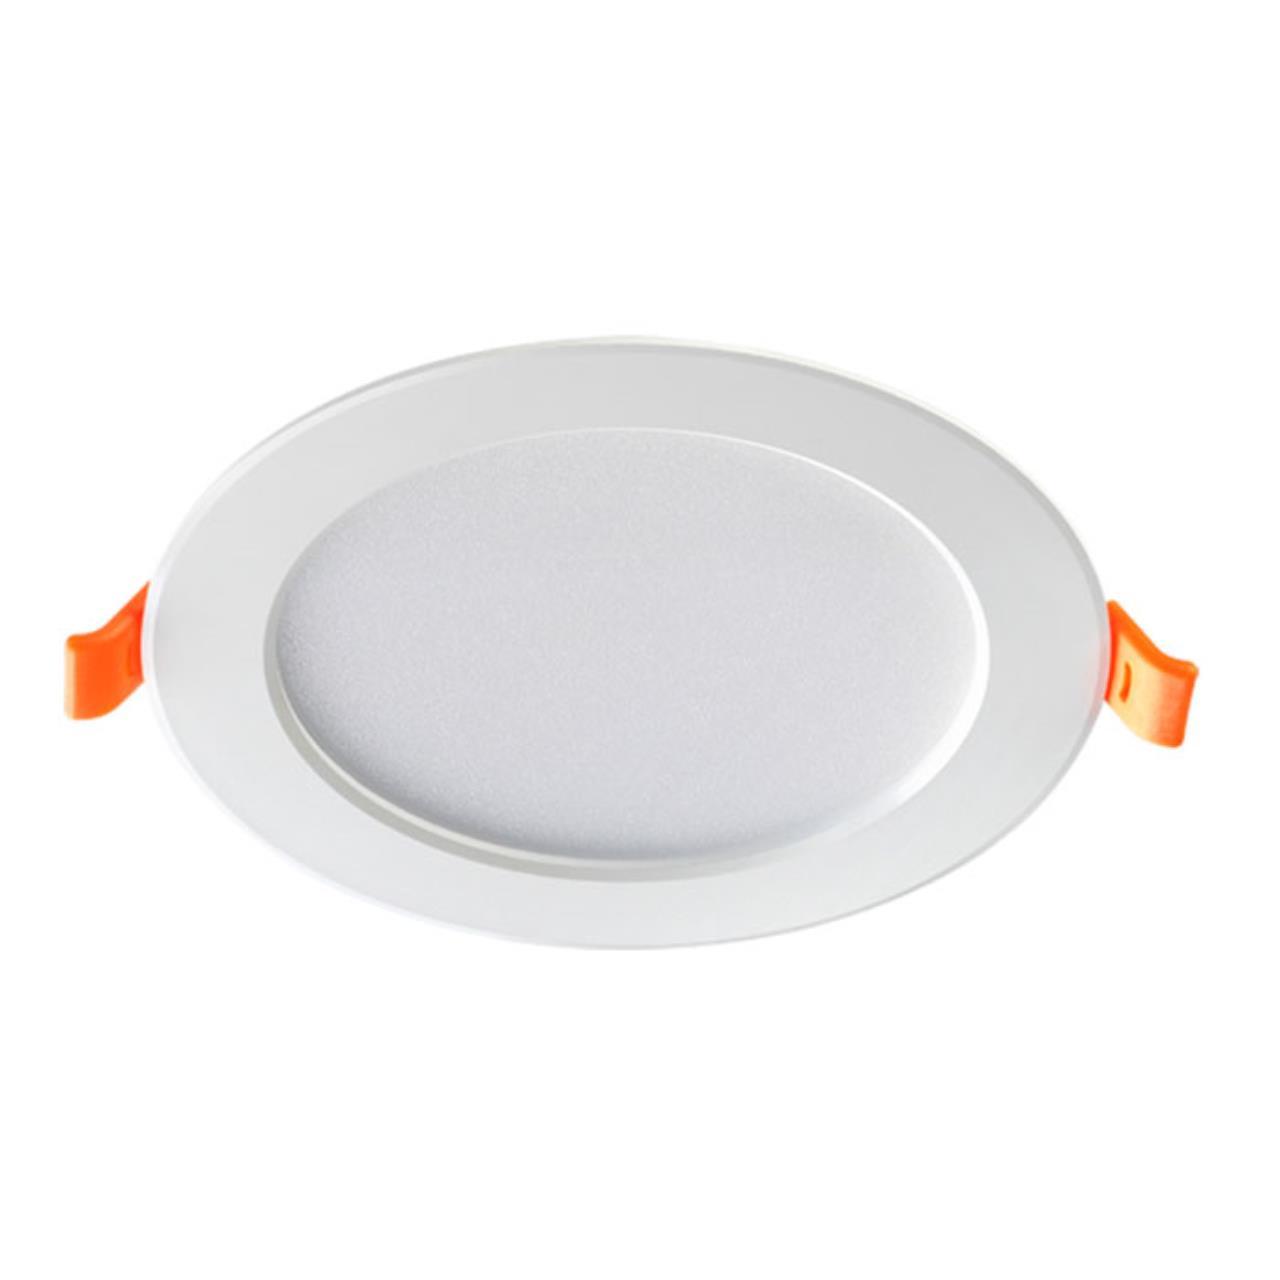 357572 SPOT NT18 079 белый Встраиваемый светильник IP20 LED 3000K 7W 175-265V LUNA